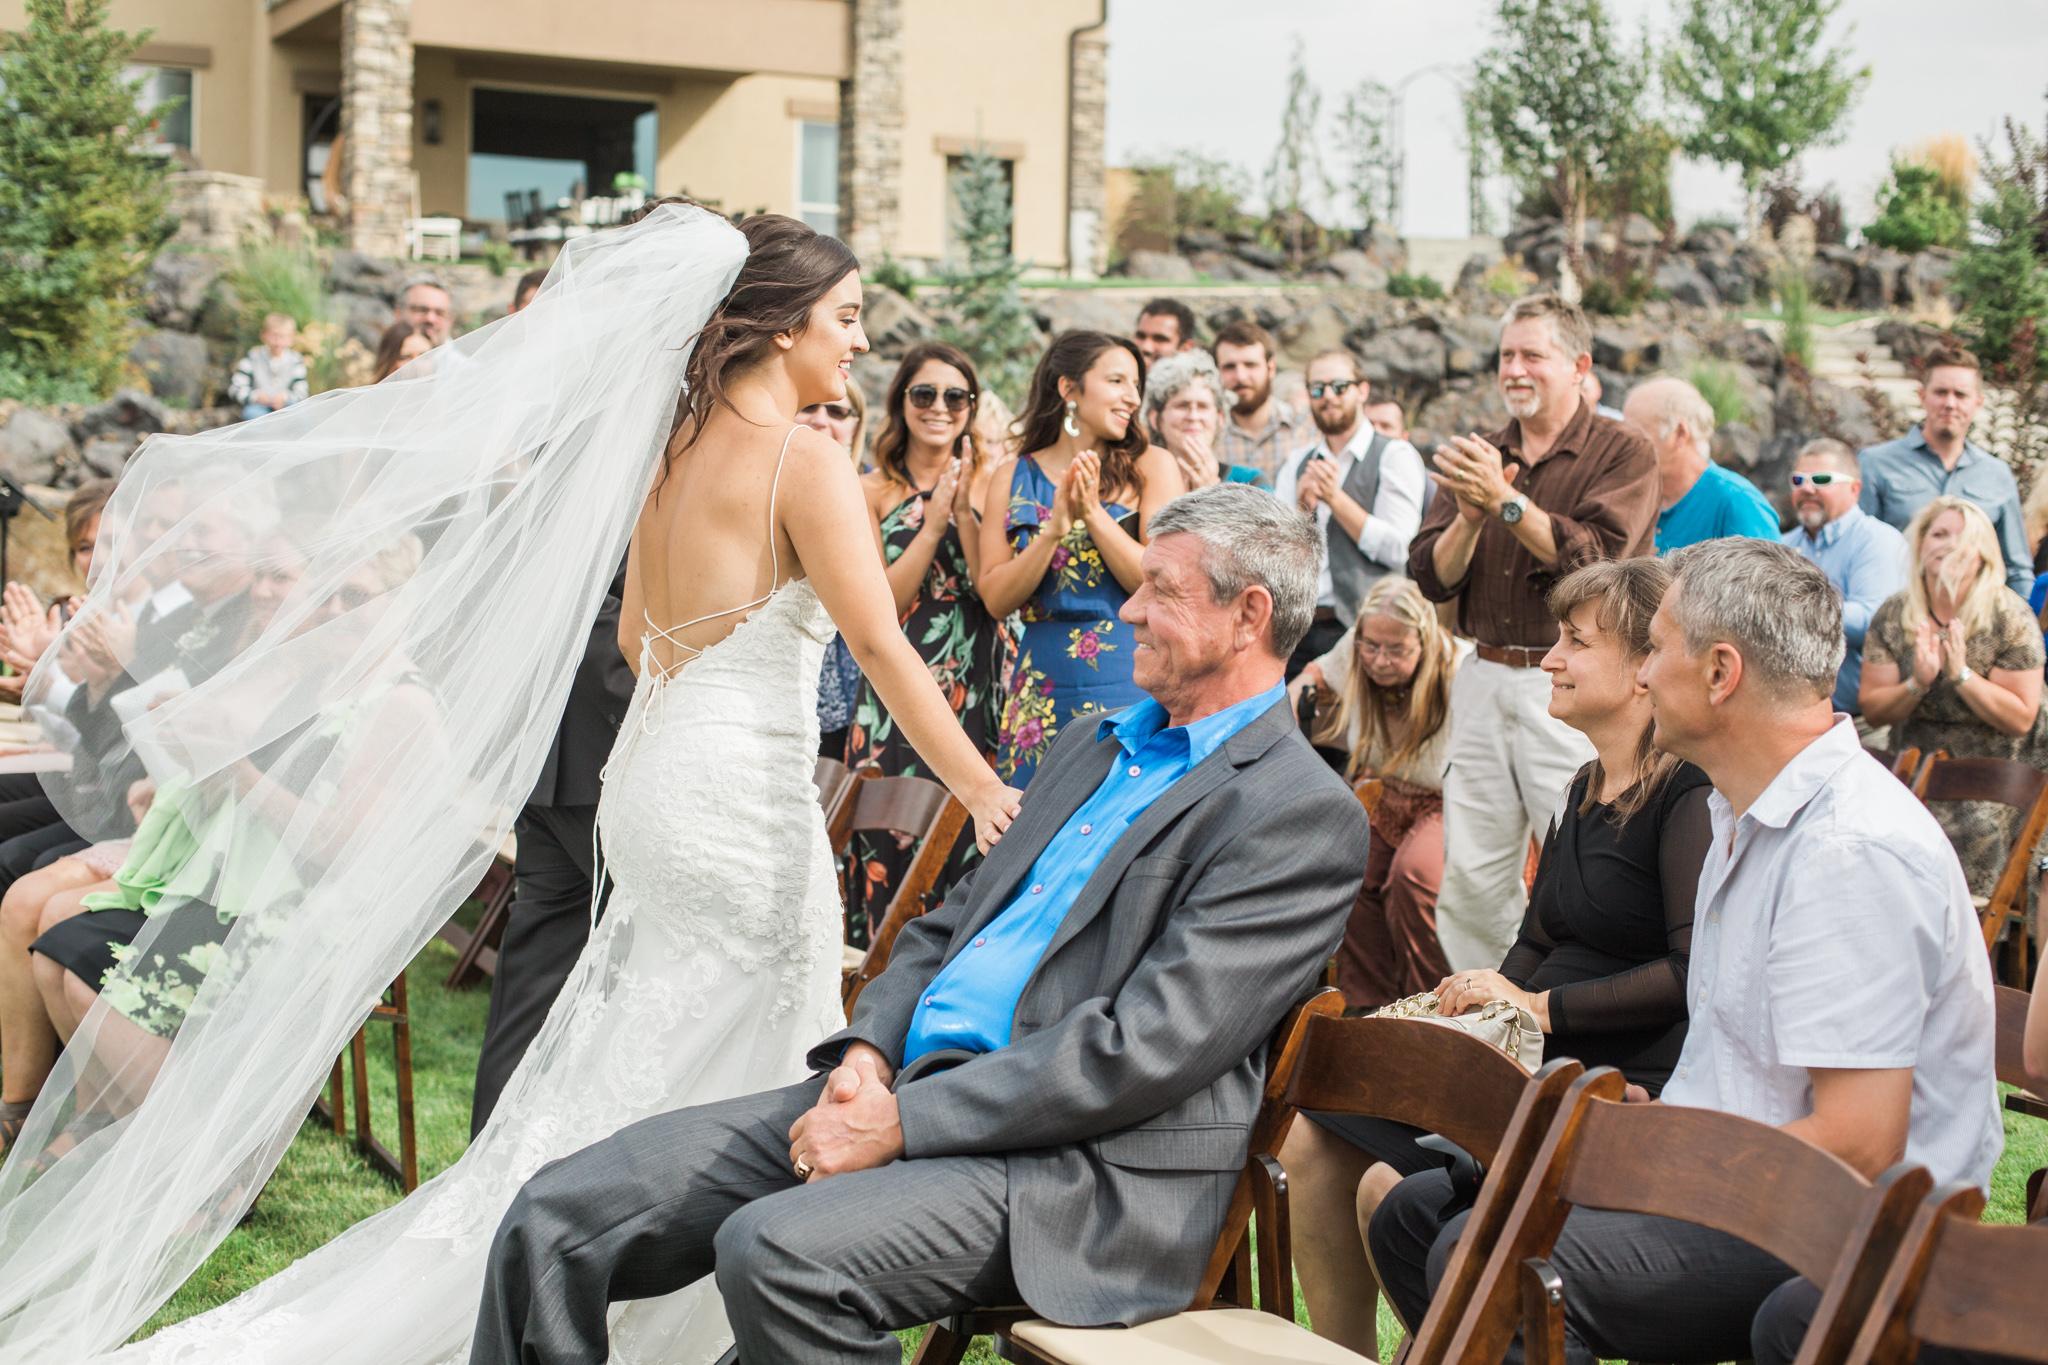 Olga_janni_wedding_090917_WEBSIZE (371 of 704).JPG